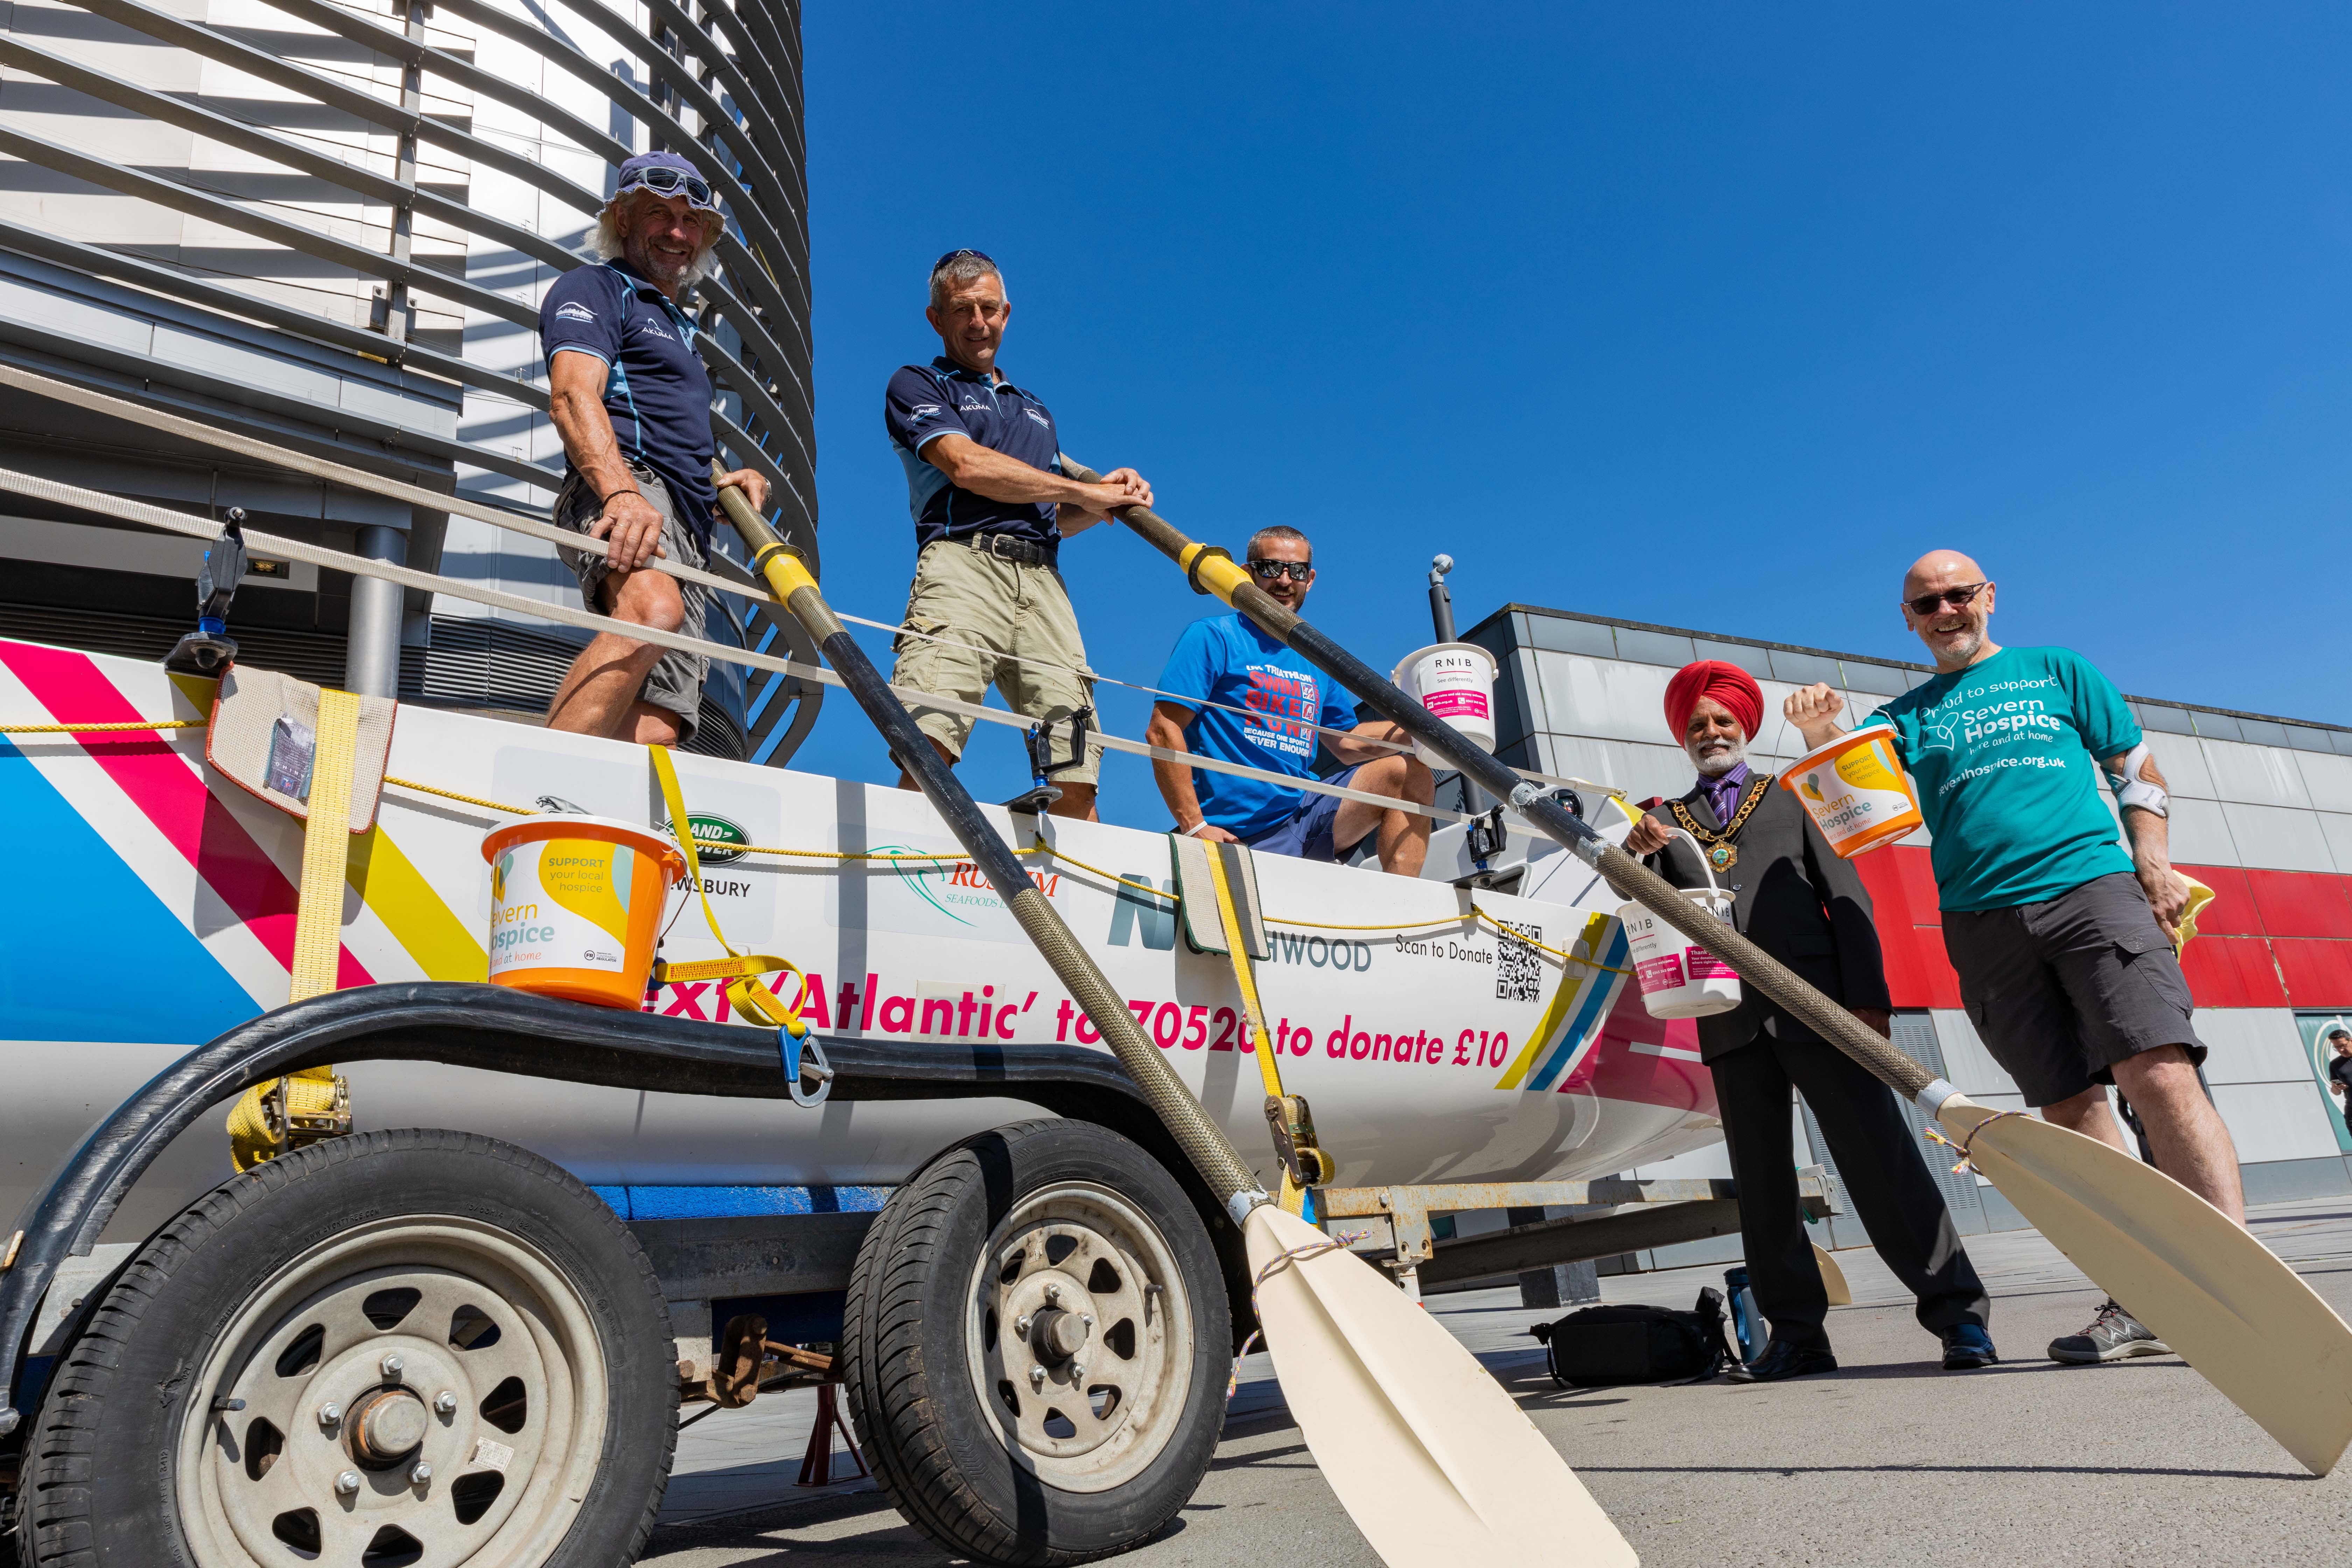 Wrekin Rowers get set for Atlantic adventure